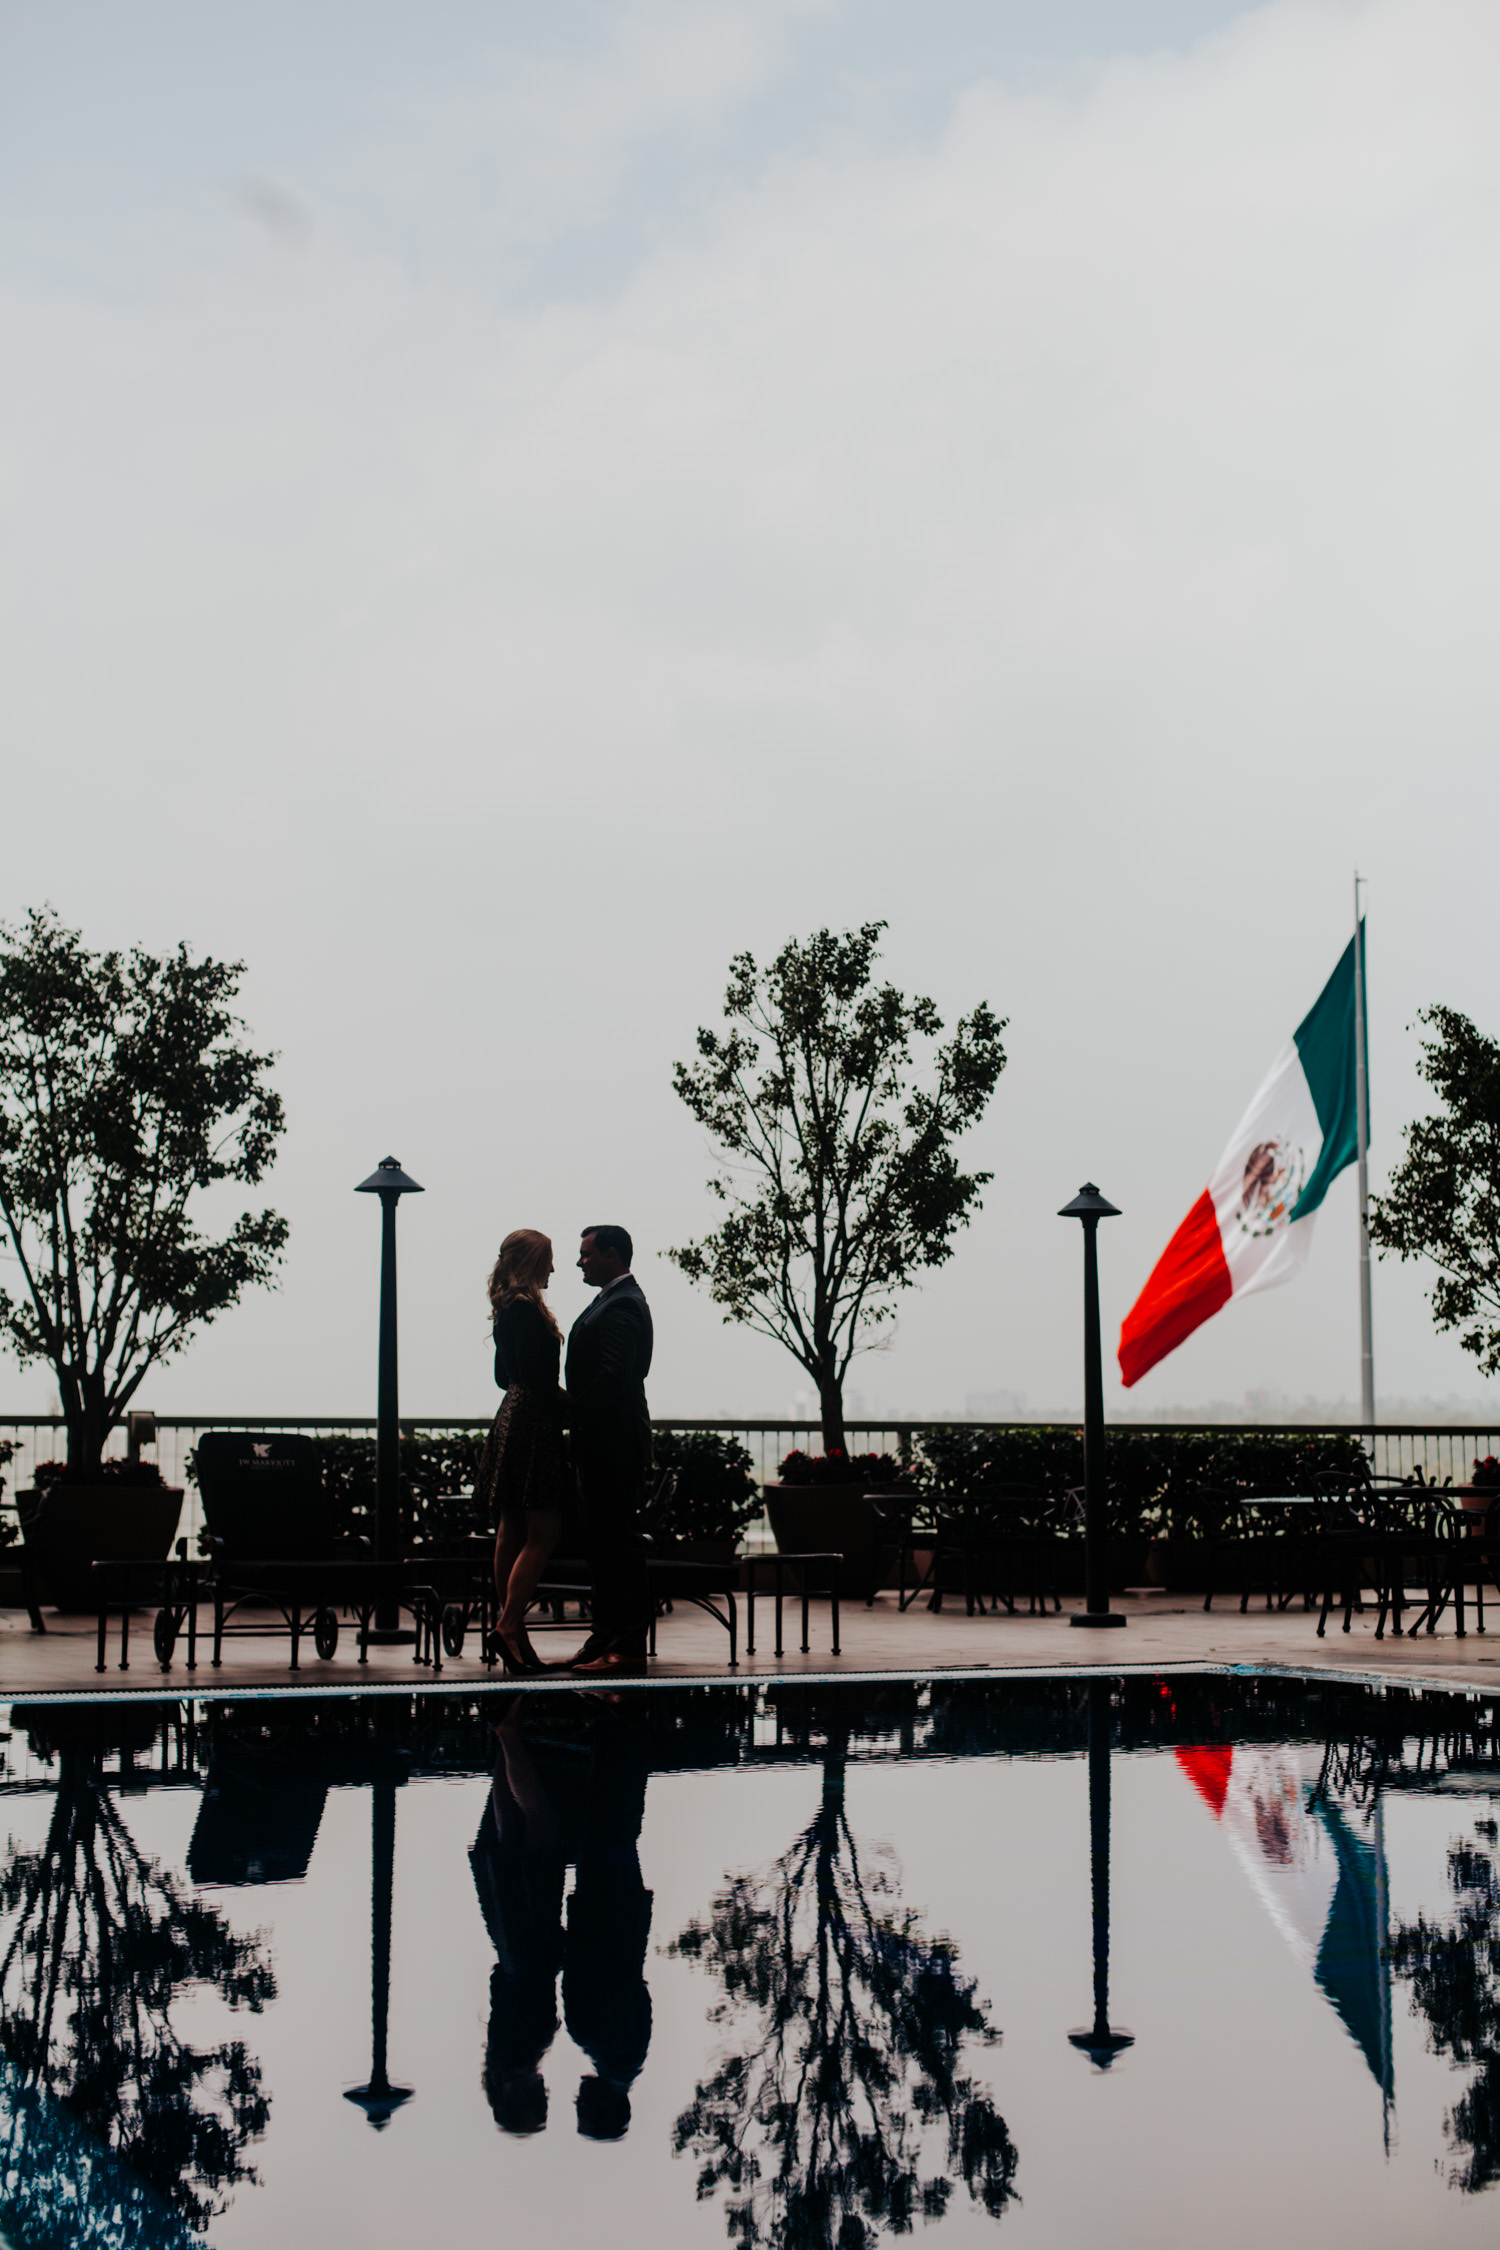 fotografo-mexico-df-boda-wedding-jw-marriot-hotel-polanco-chapultepec-pierce-16.jpg